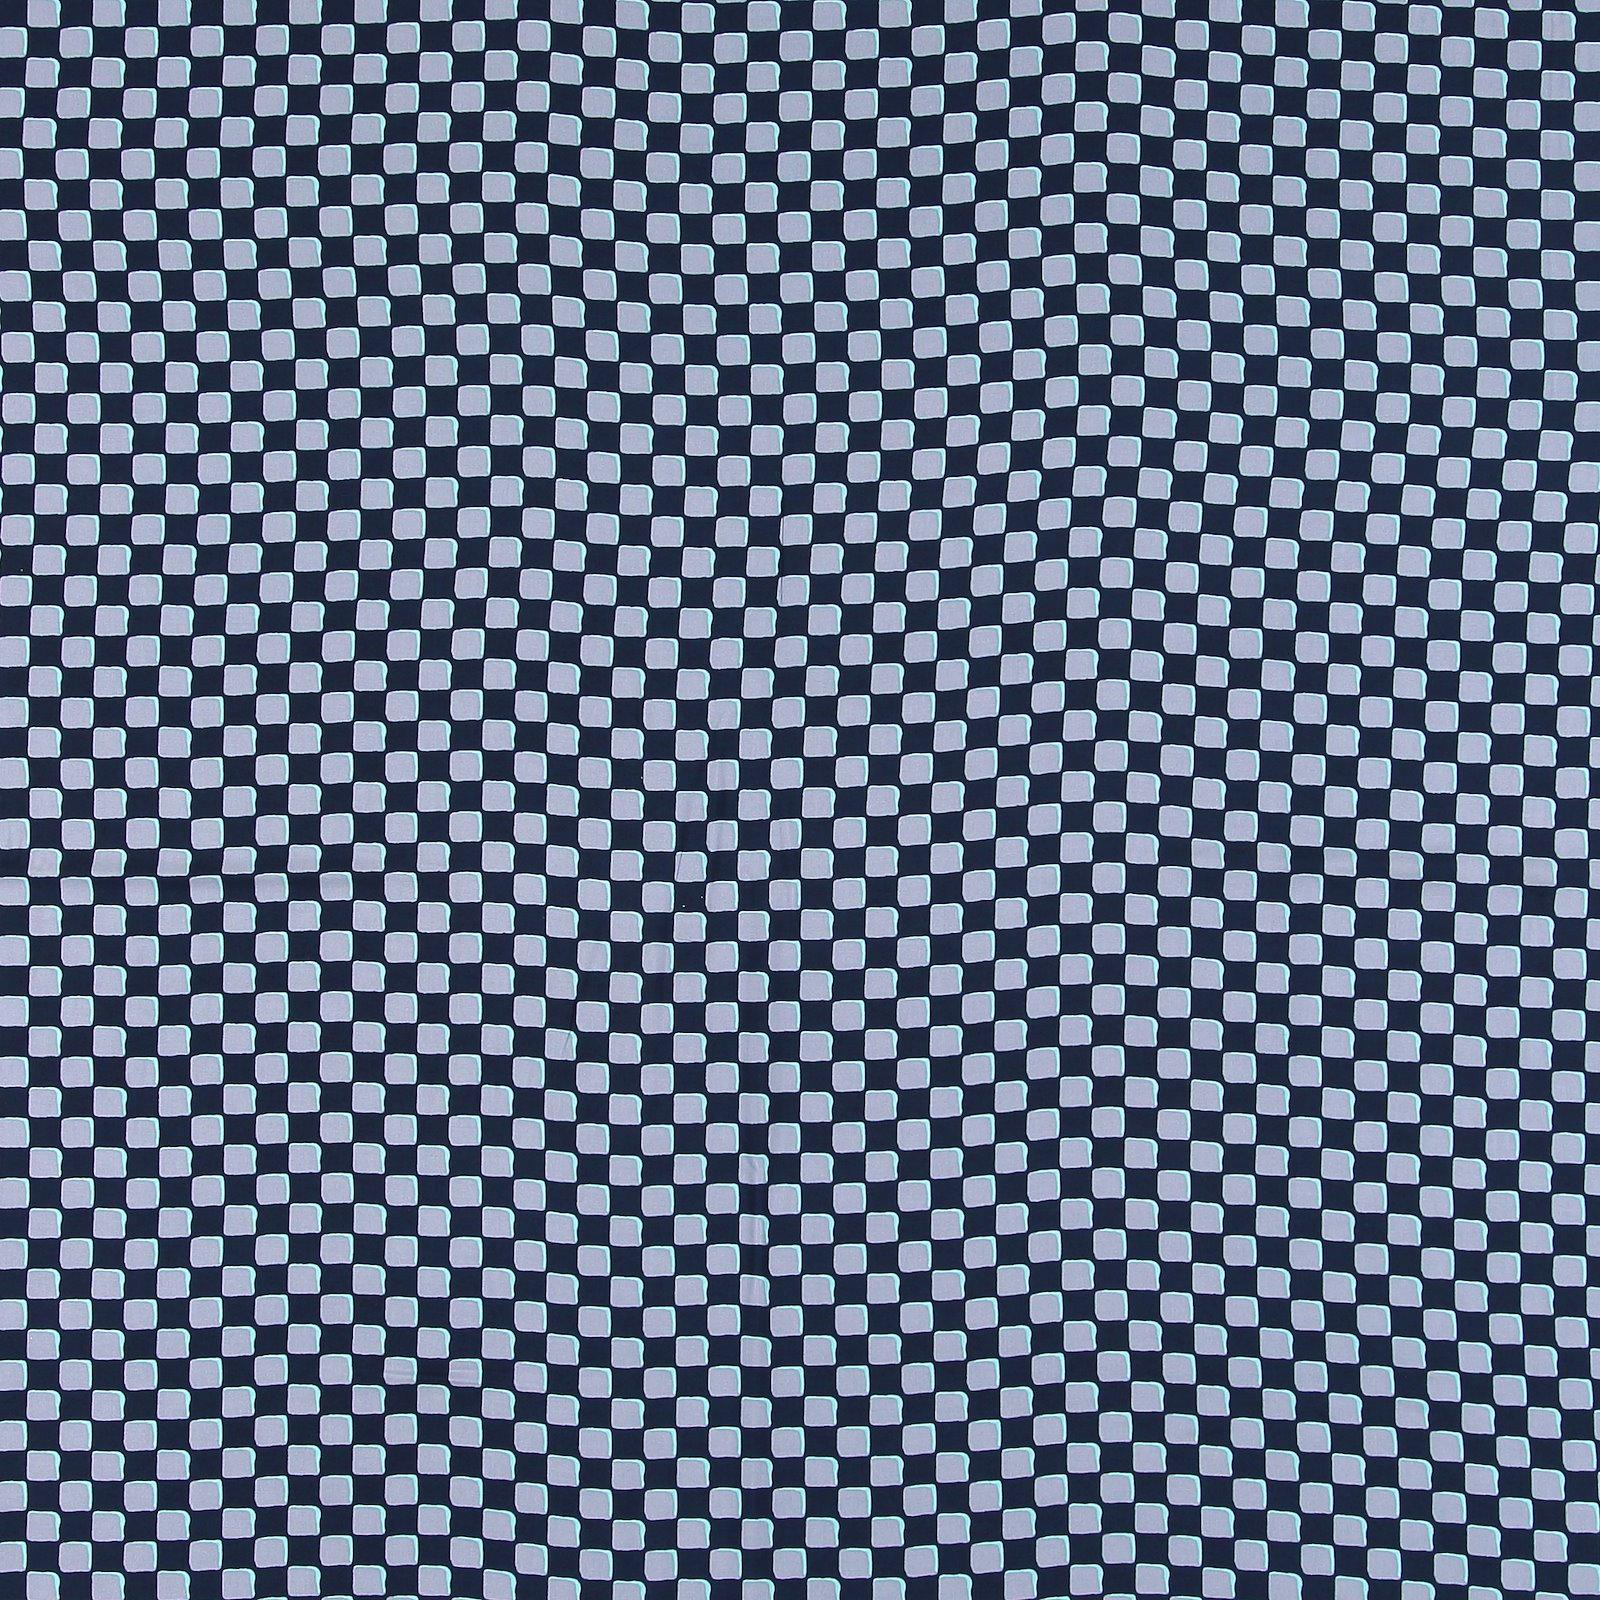 Ecovero woven viscose dark blue w check 710675_pack_sp